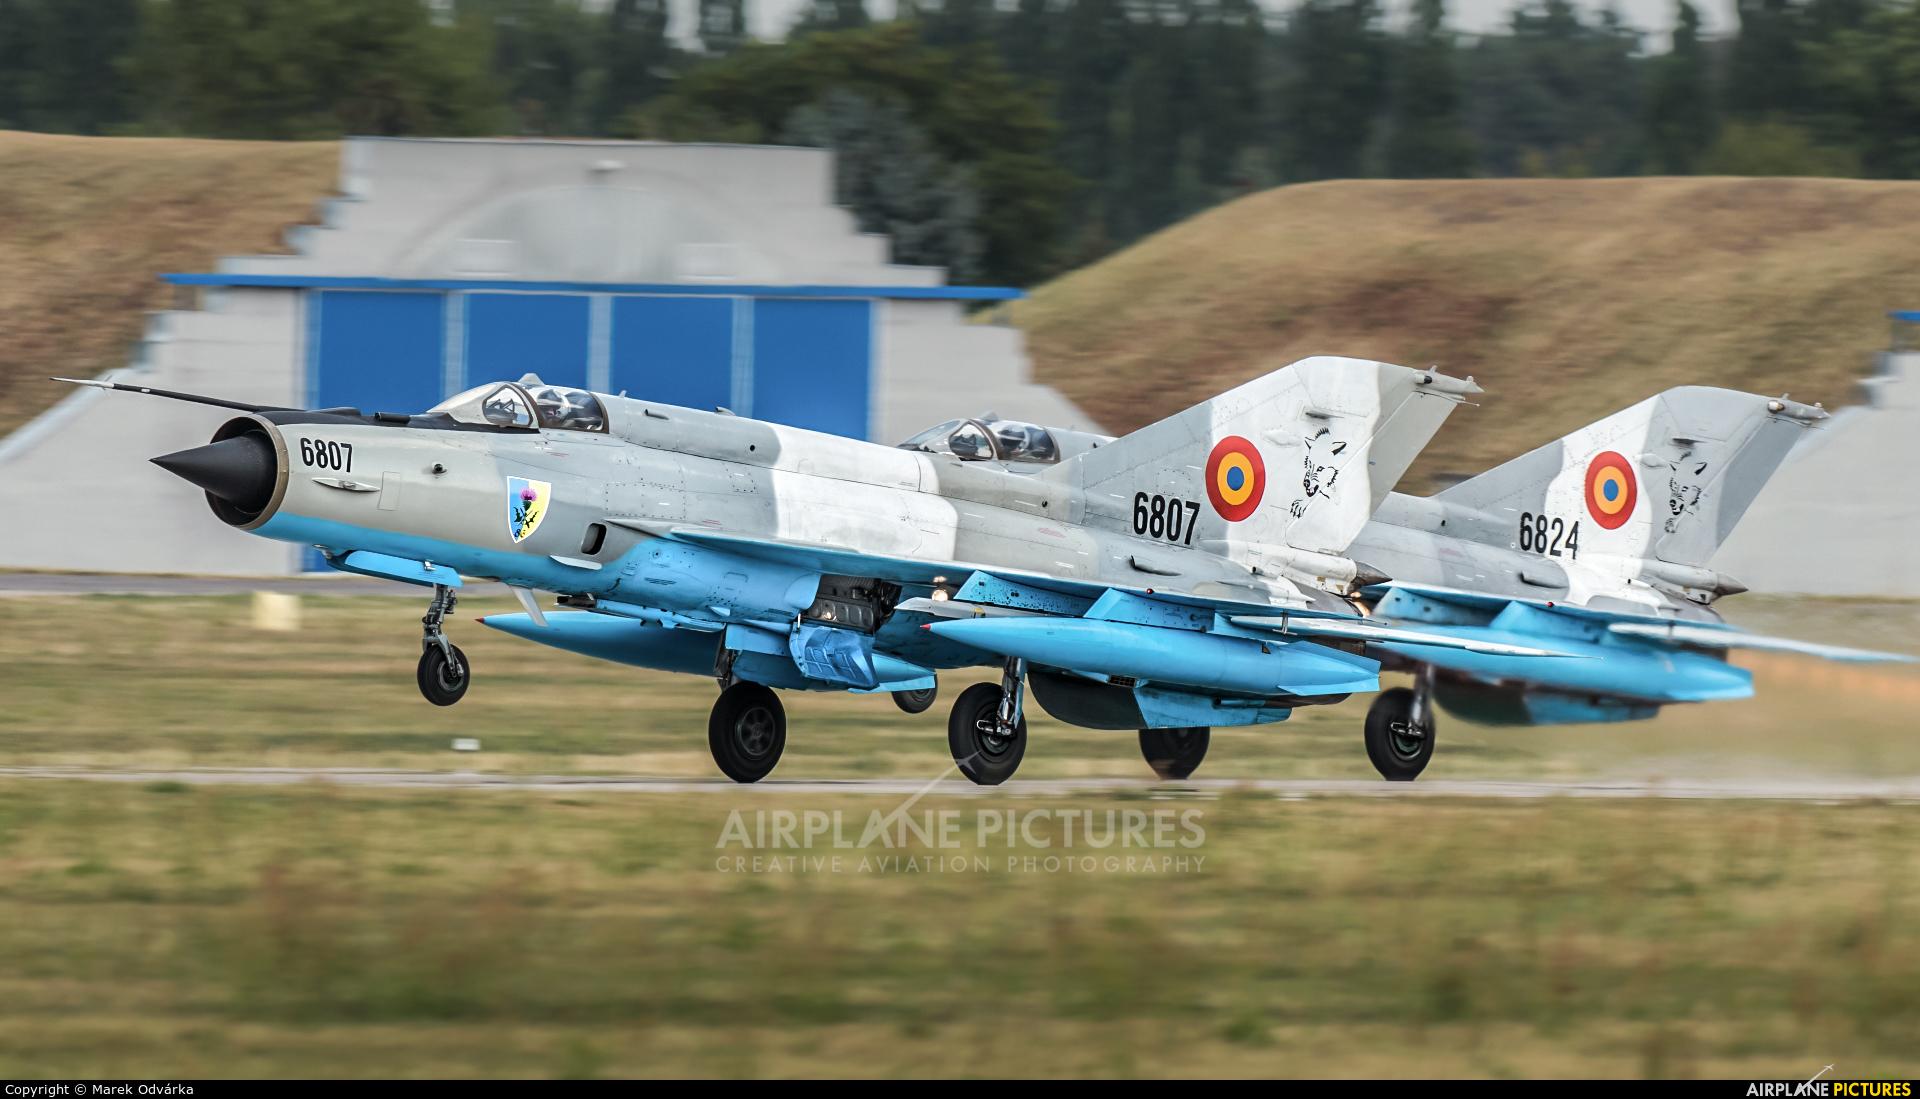 Romania - Air Force 6807 aircraft at Pardubice